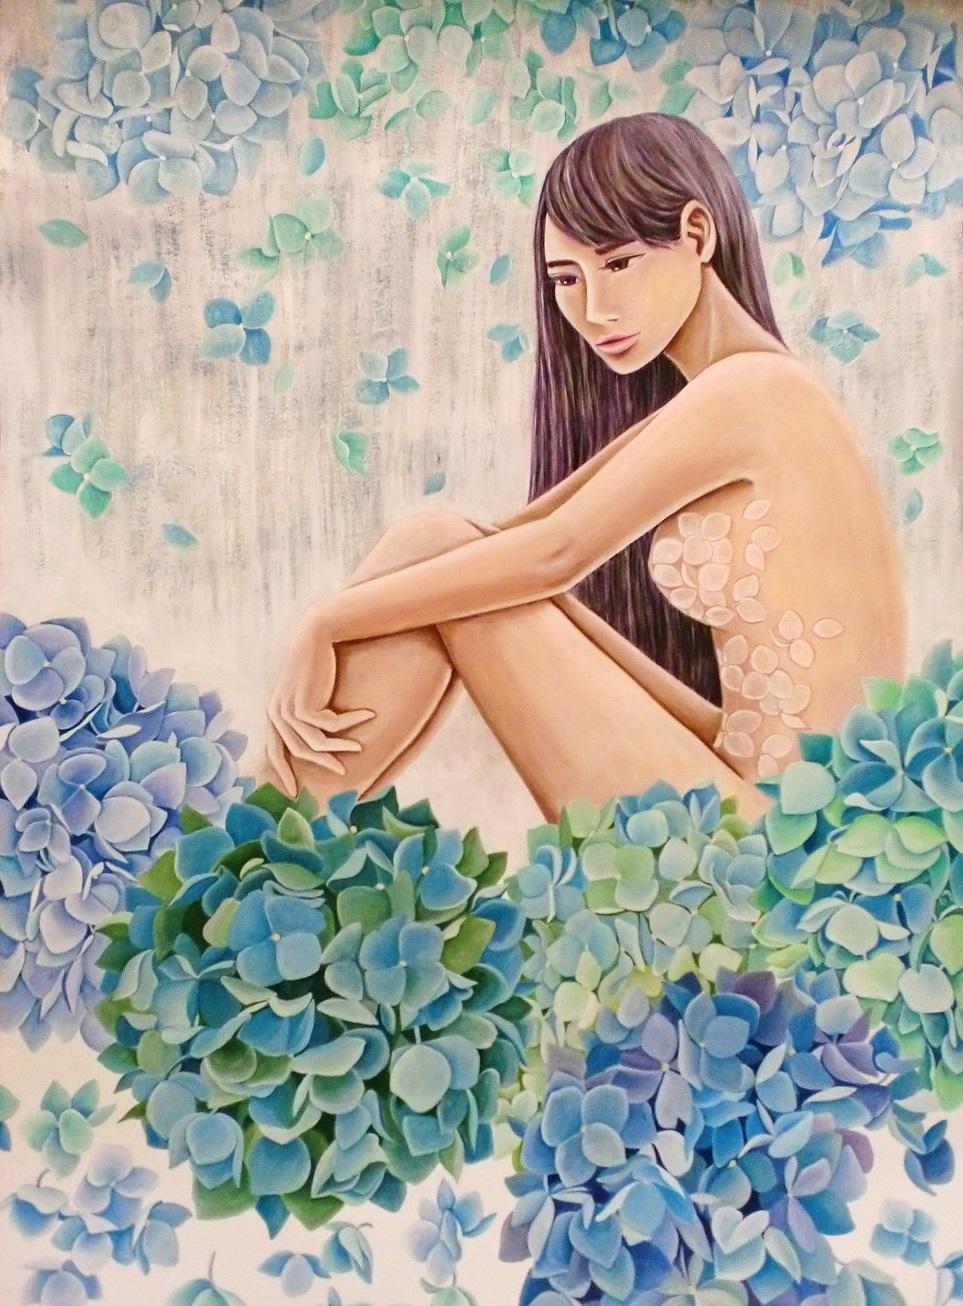 Megumi Muto